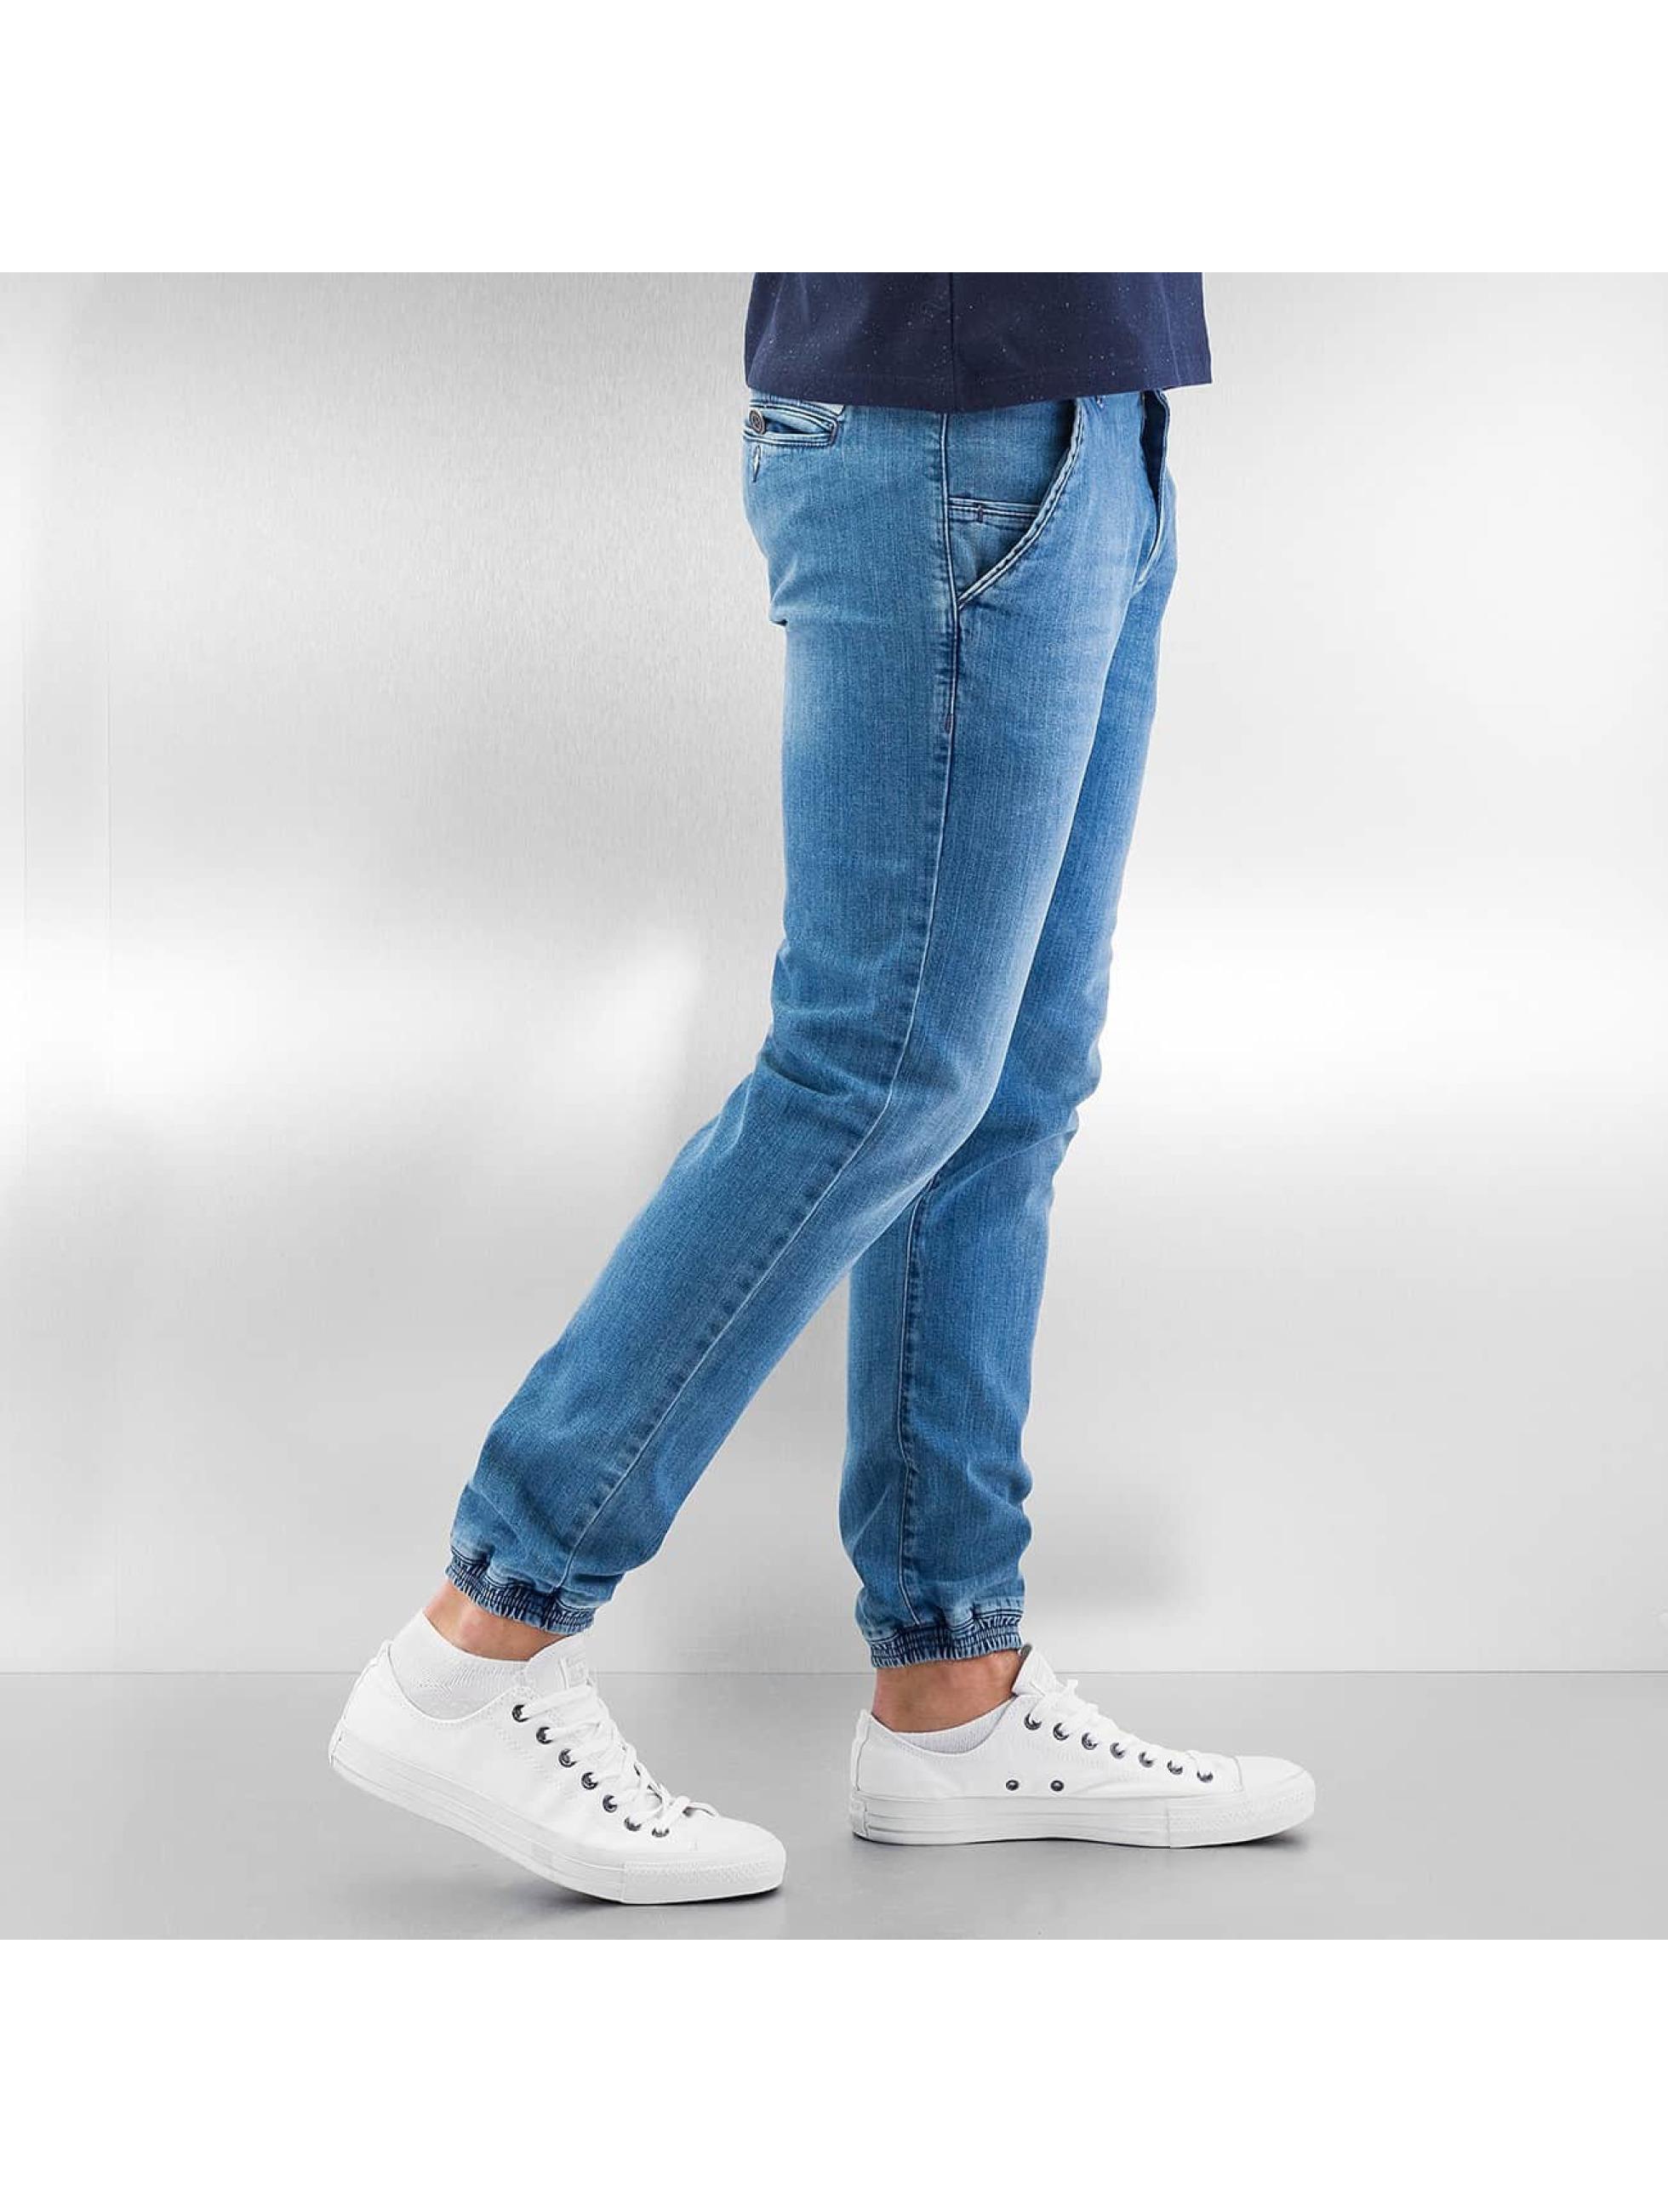 Reell Jeans Pantalon chino Jogger indigo